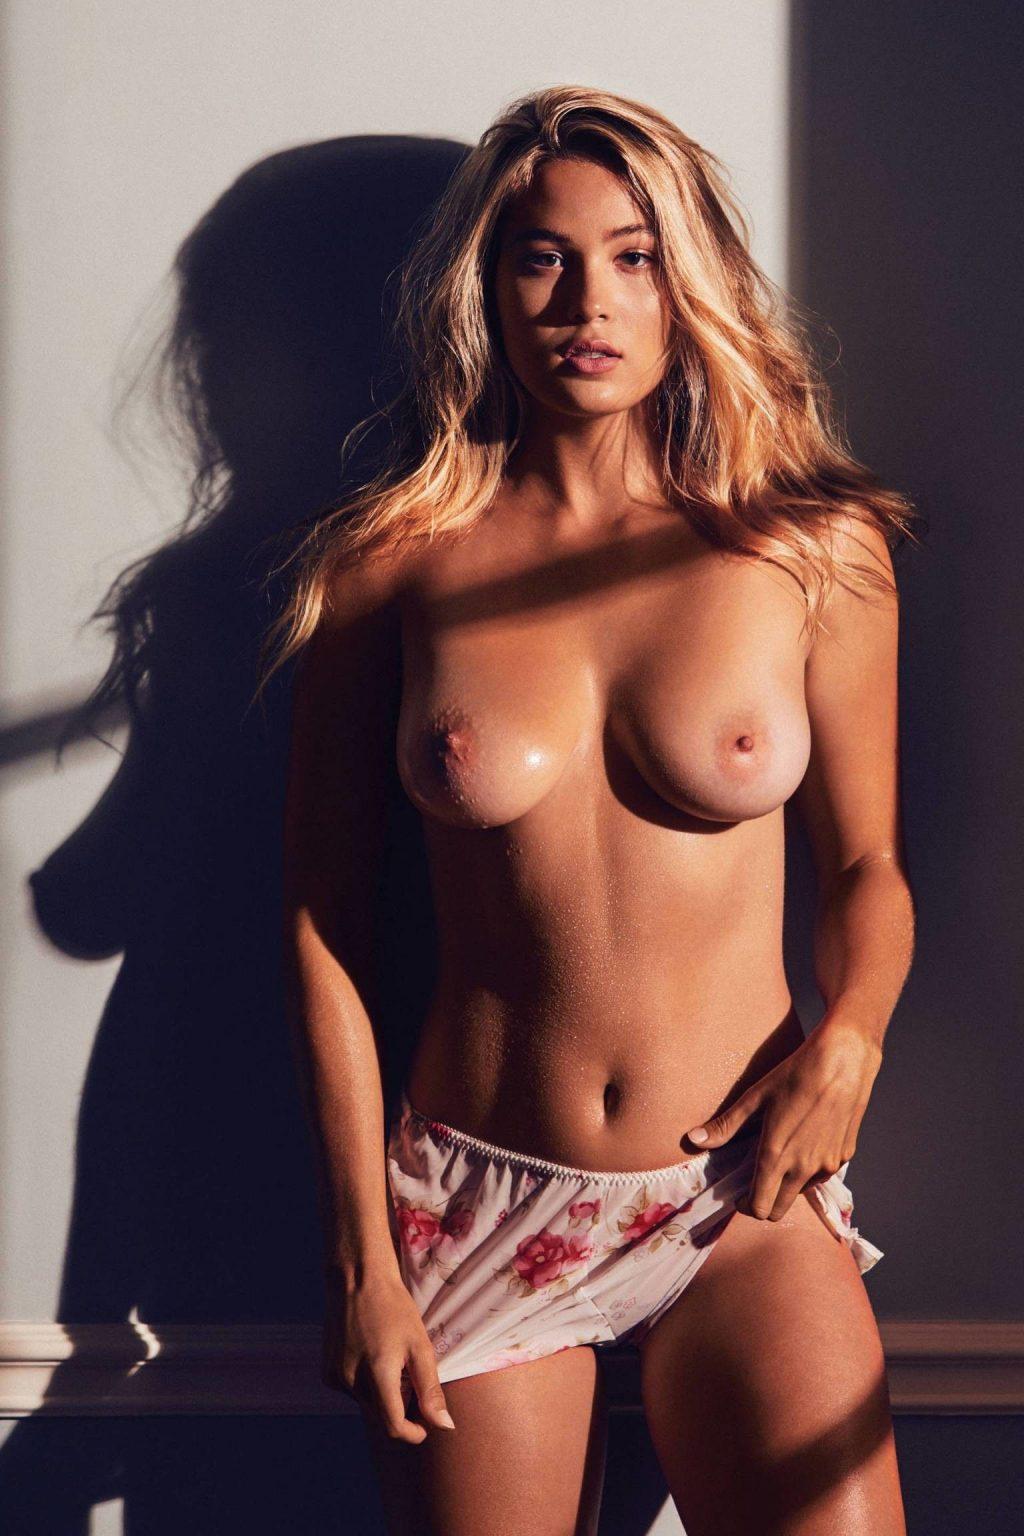 Renee jordan porn star nude